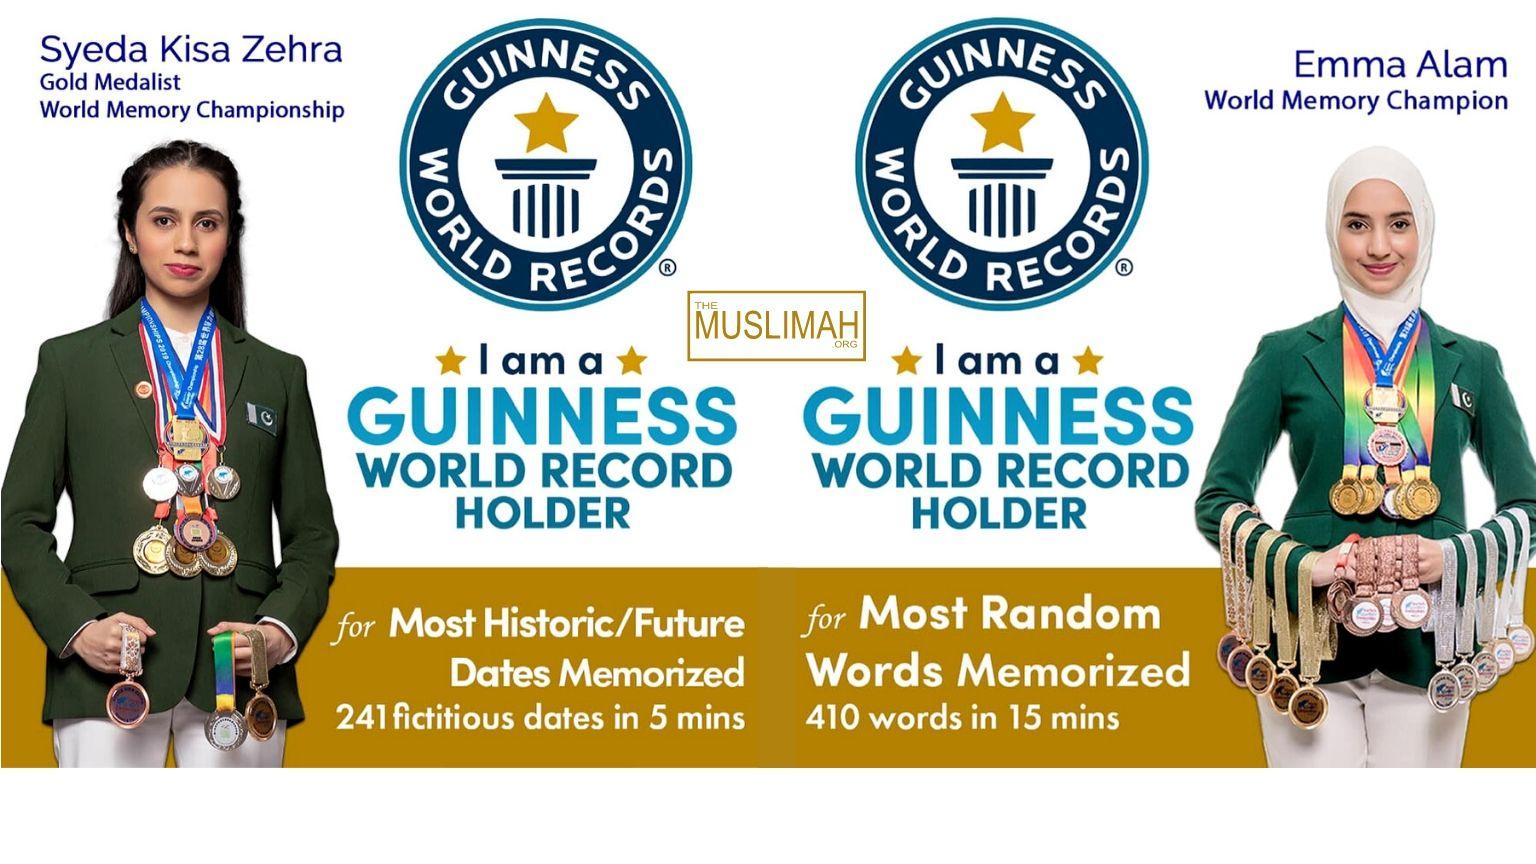 Pakistani girls beat India, Sweden at three Guinness World Records | Emma Alam | Syeda Kisa Zehra